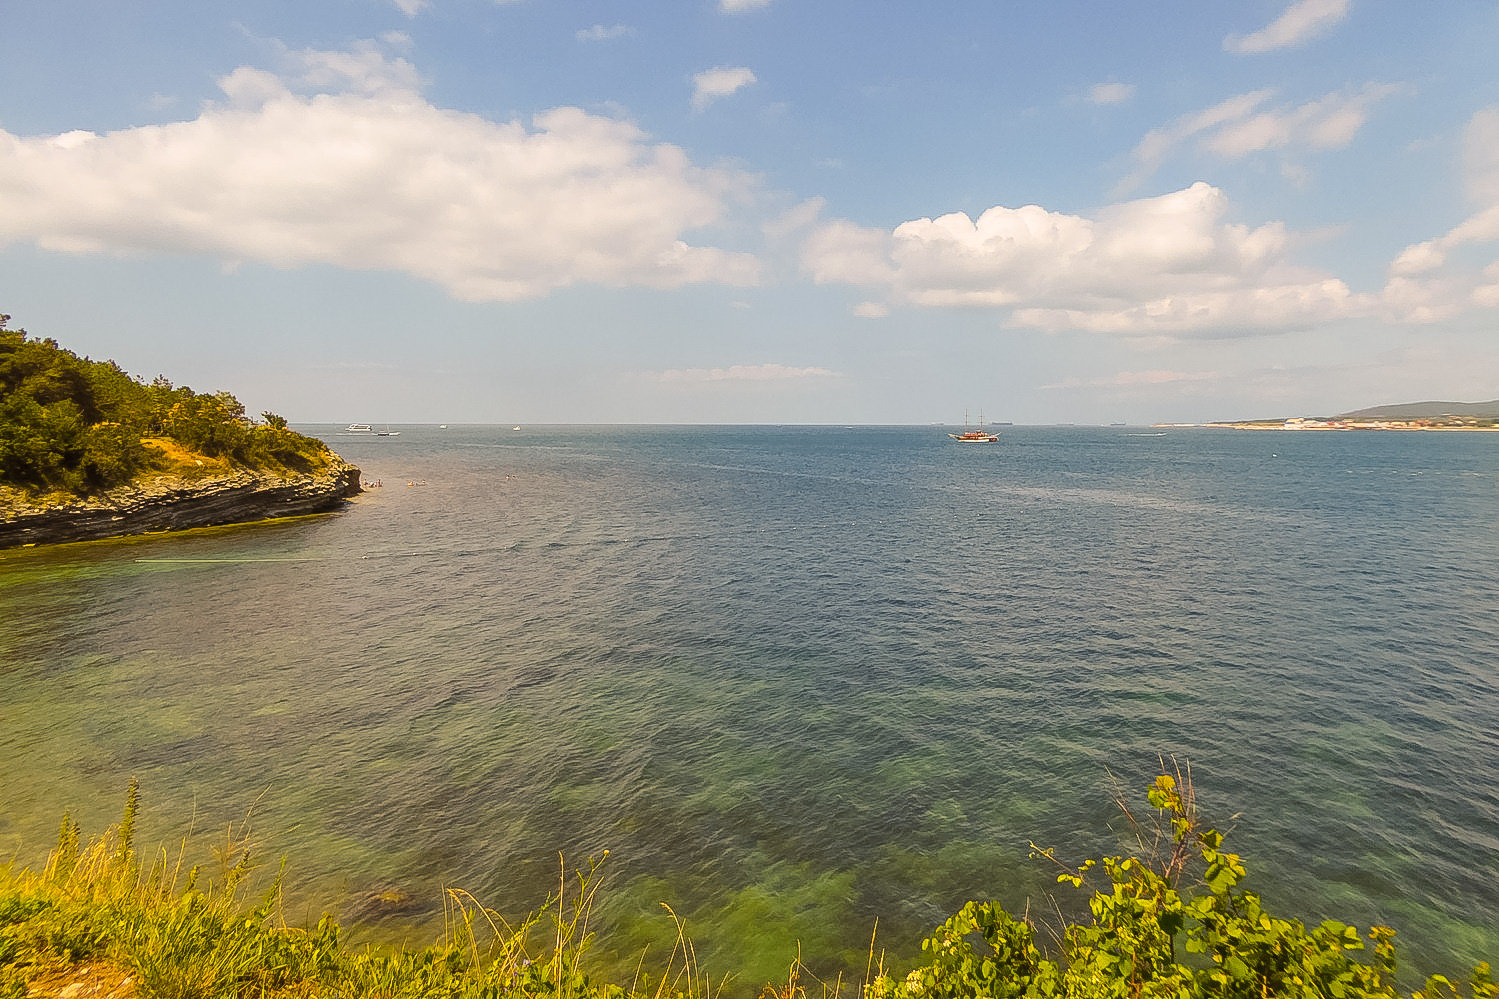 геленджик черное море фото что тесто